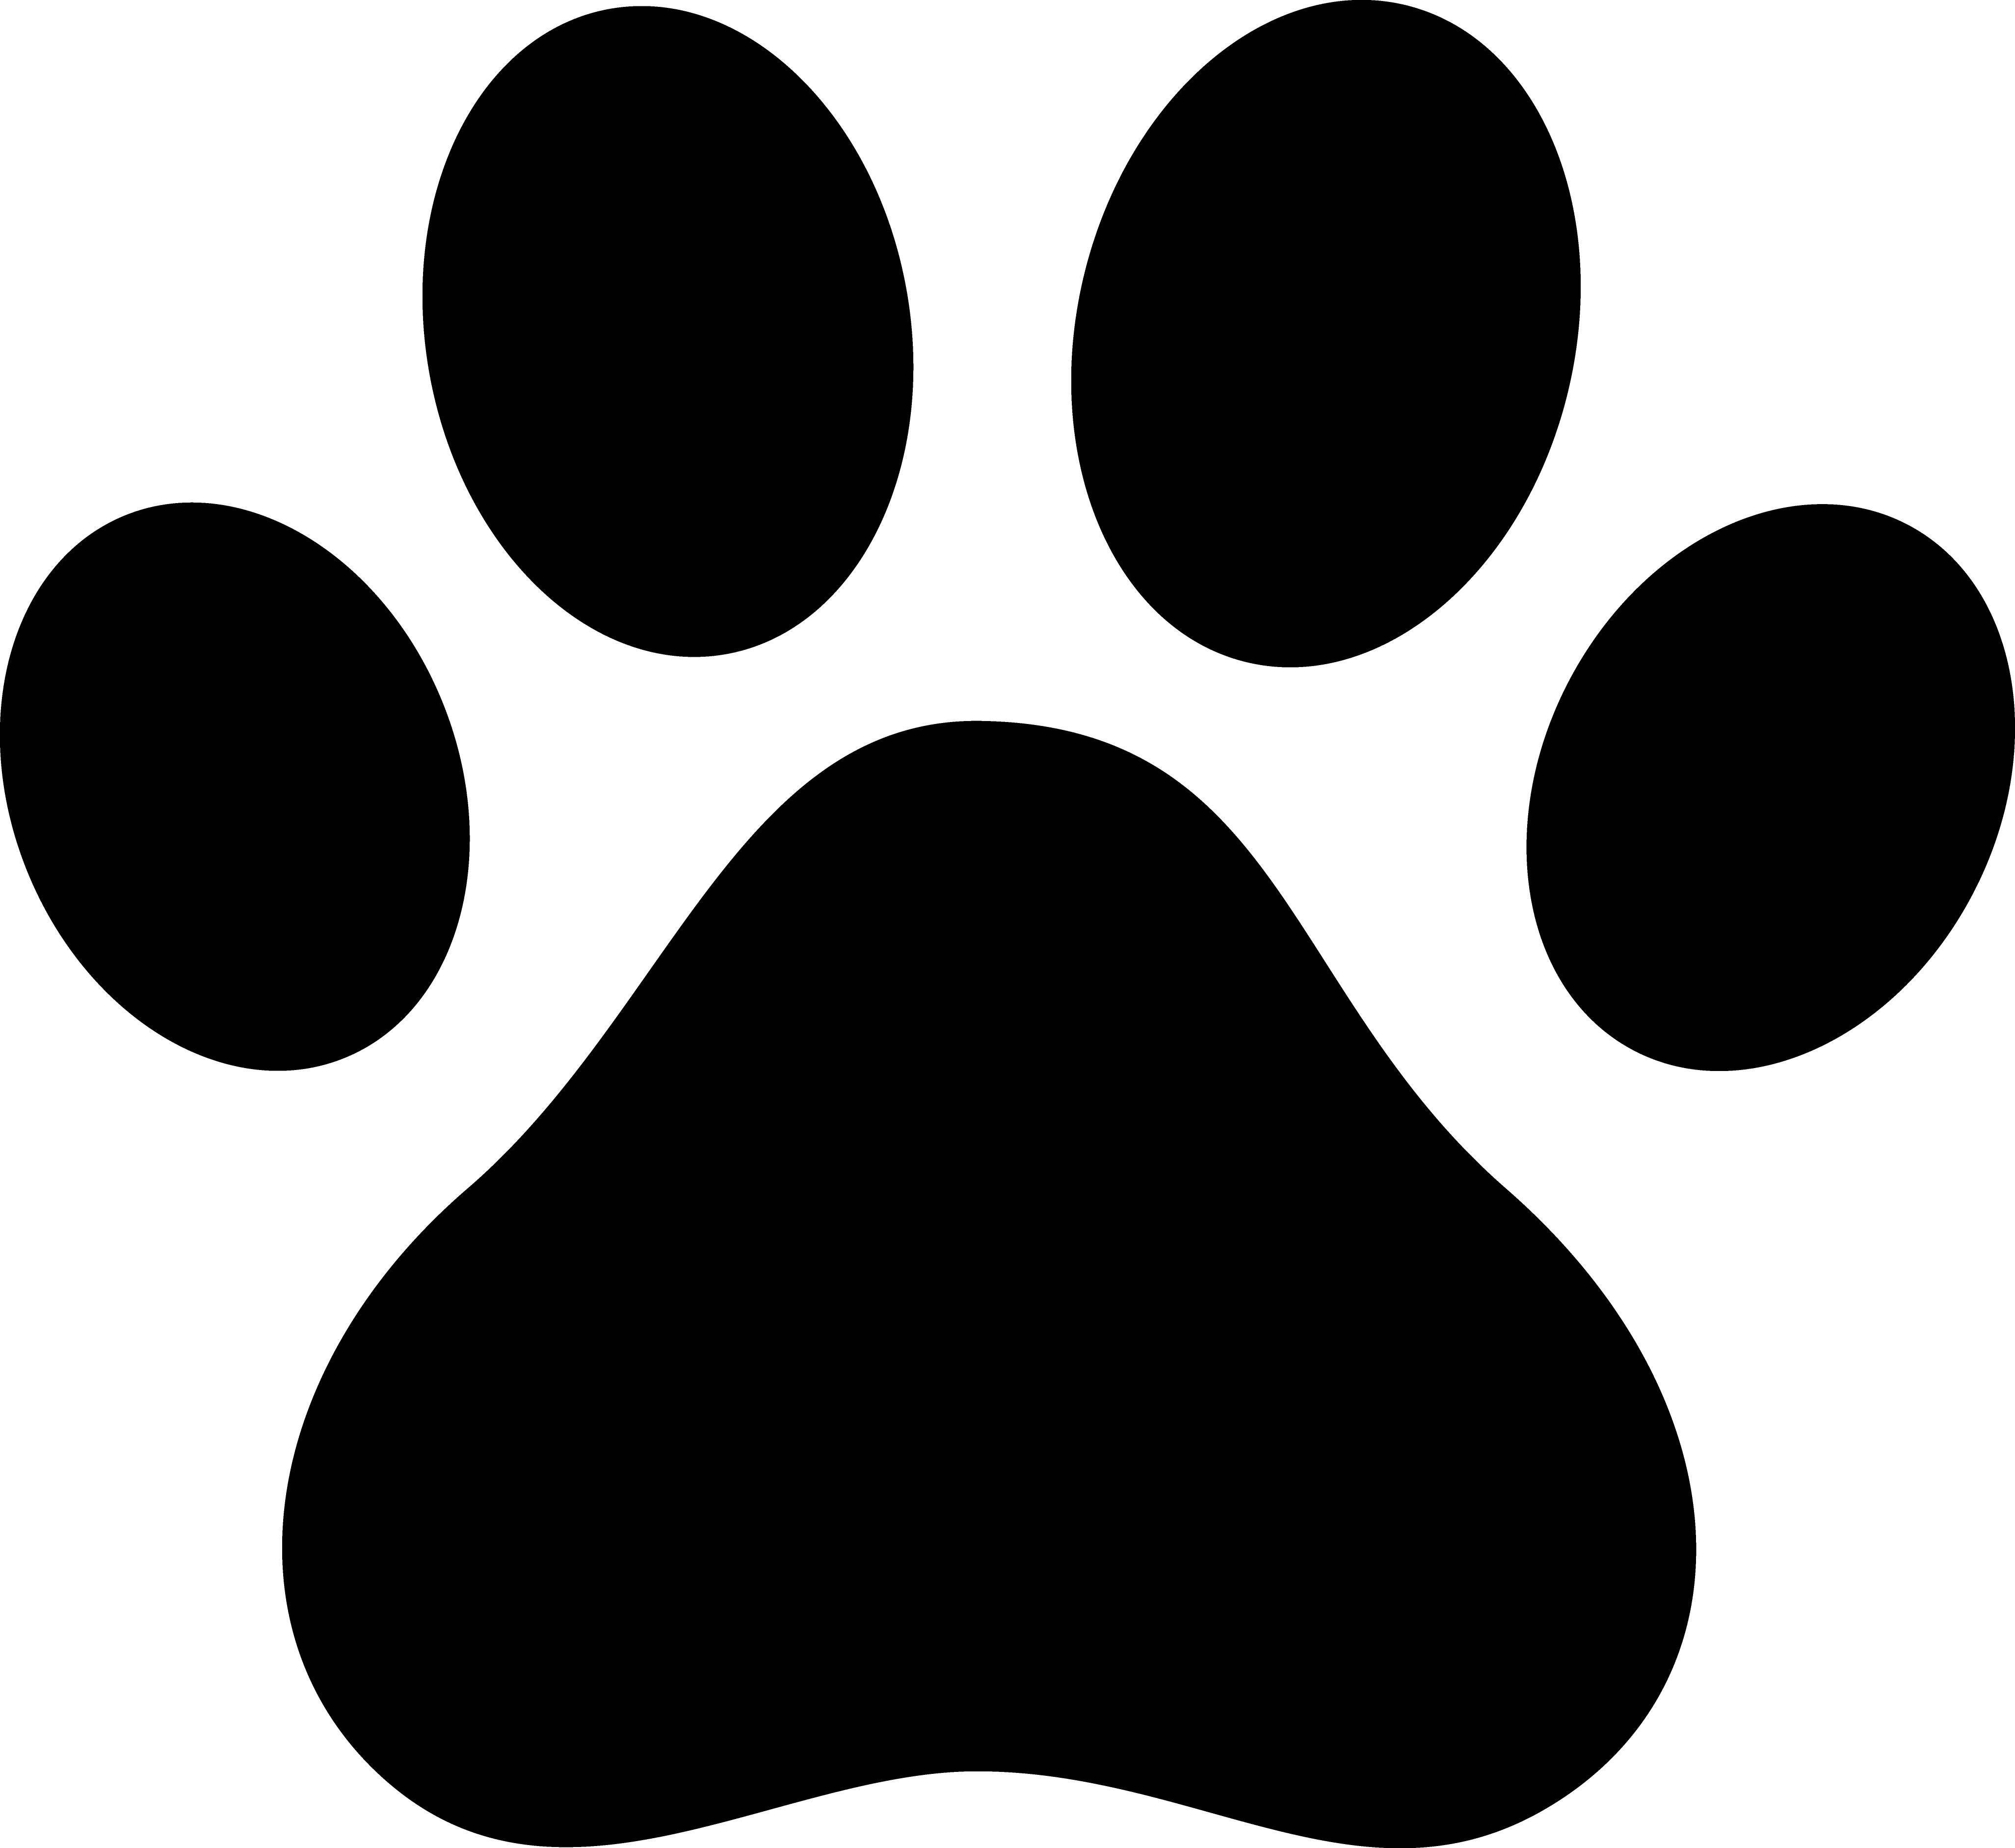 dog paw clip art | Black Paw Print Silhouette - Paw PNG HD